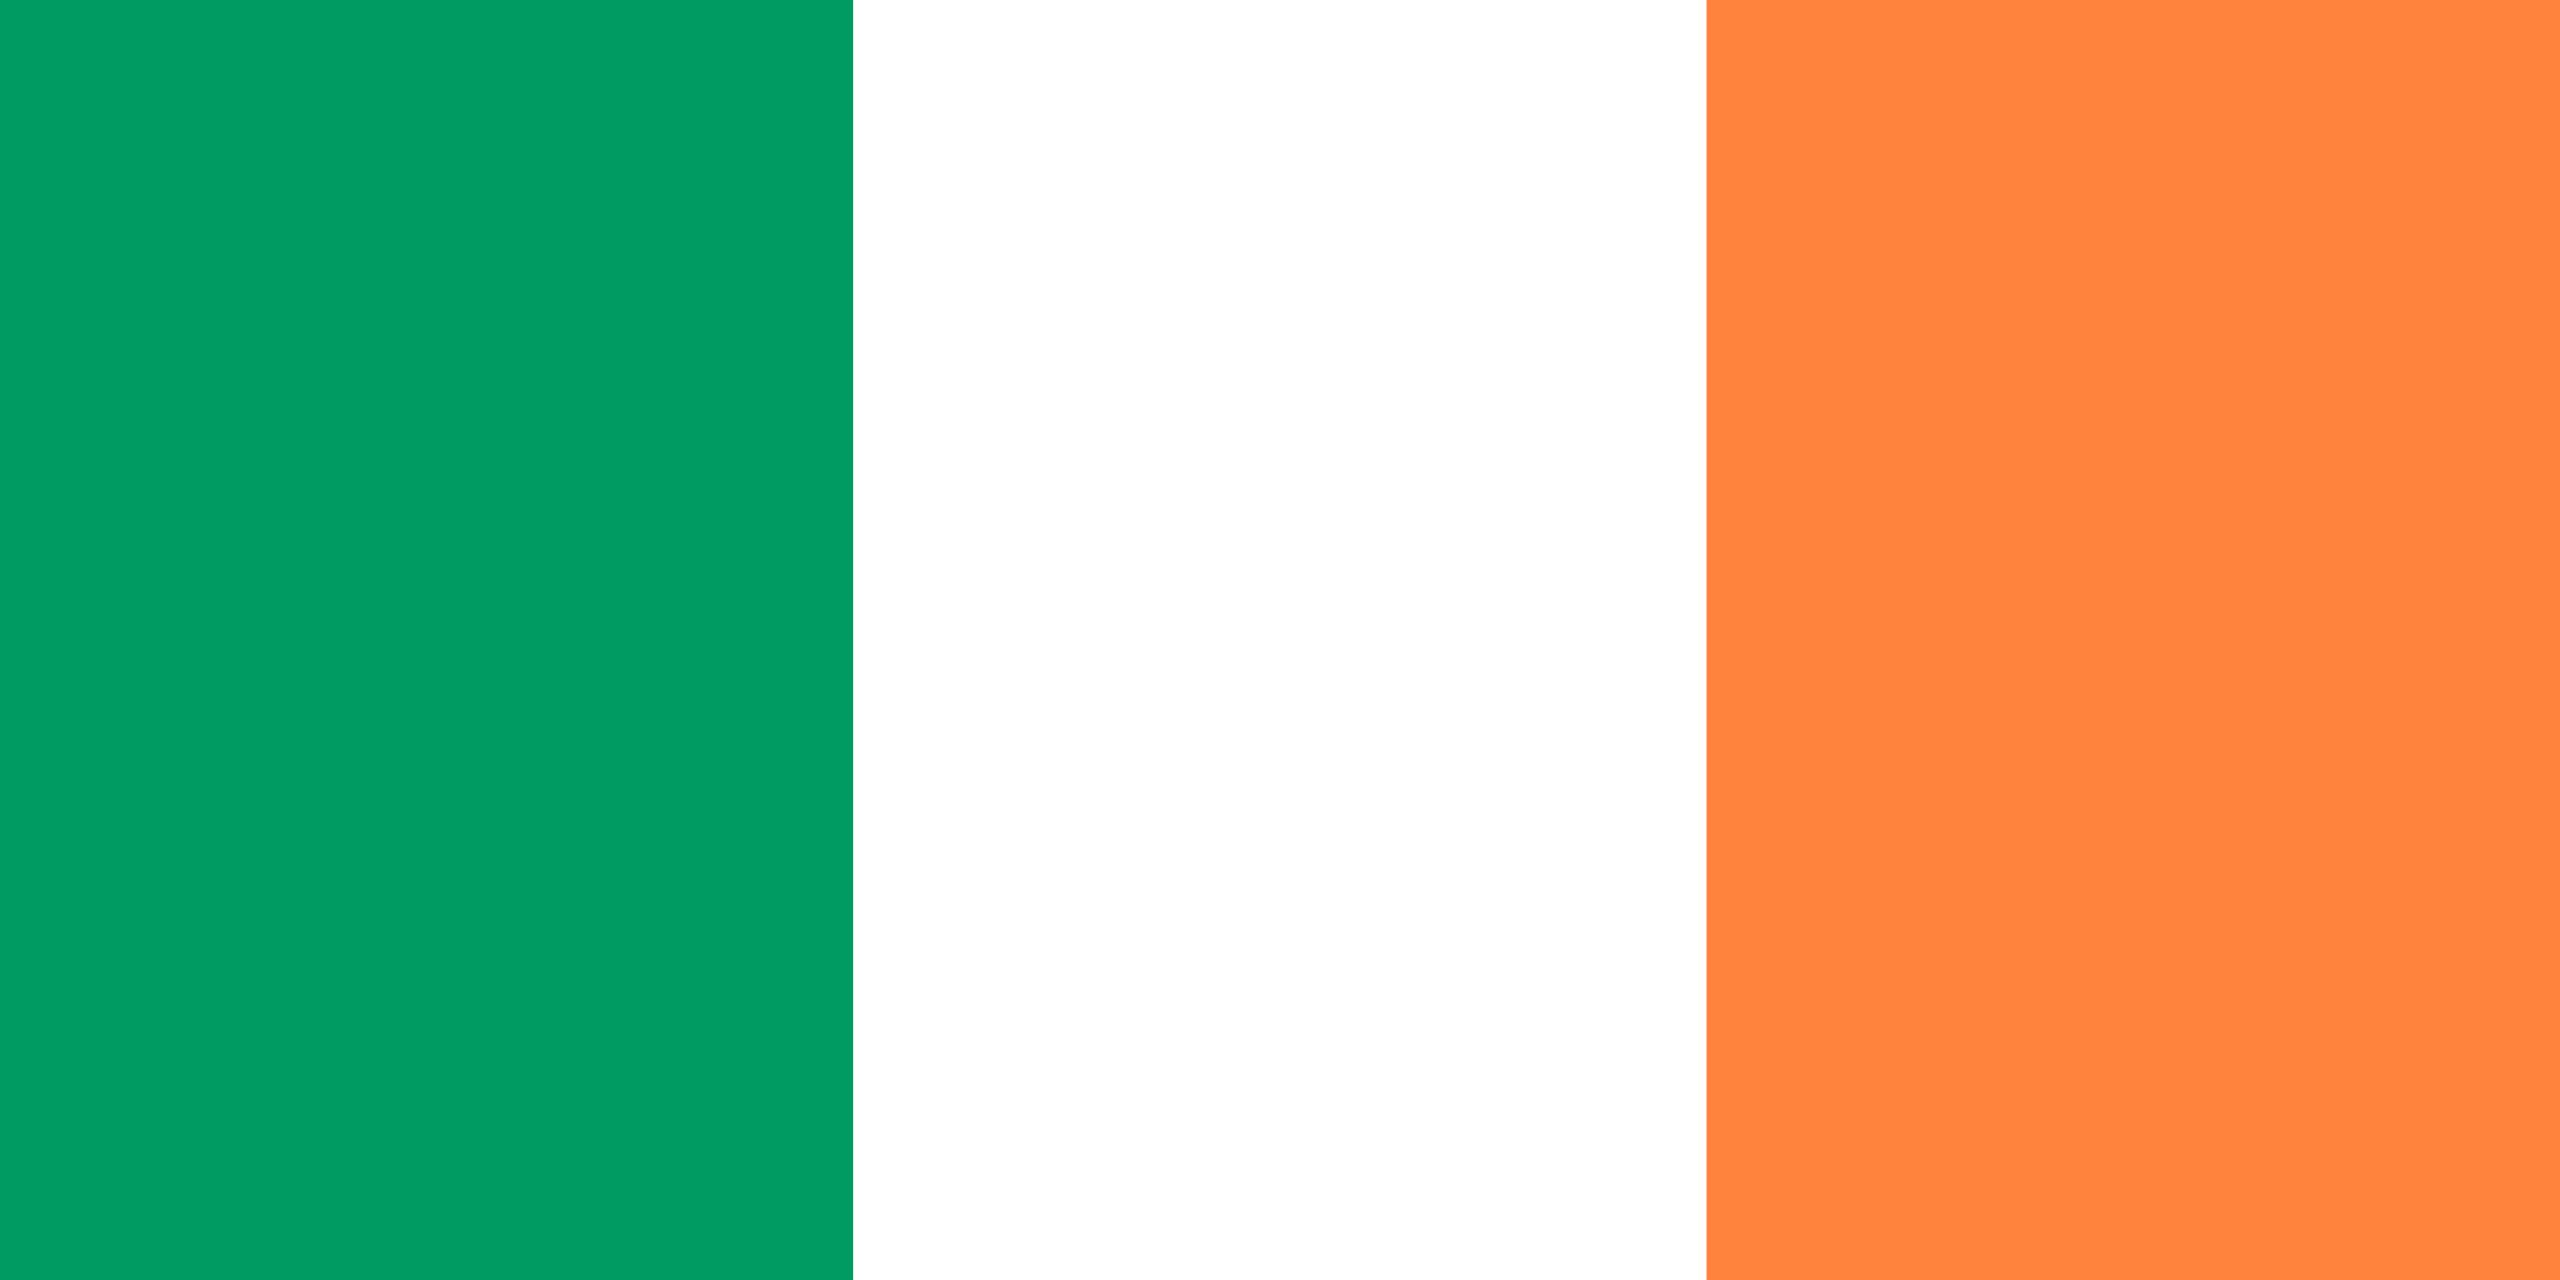 irlanda, paese, emblema, logo, simbolo - Sfondi HD - Professor-falken.com